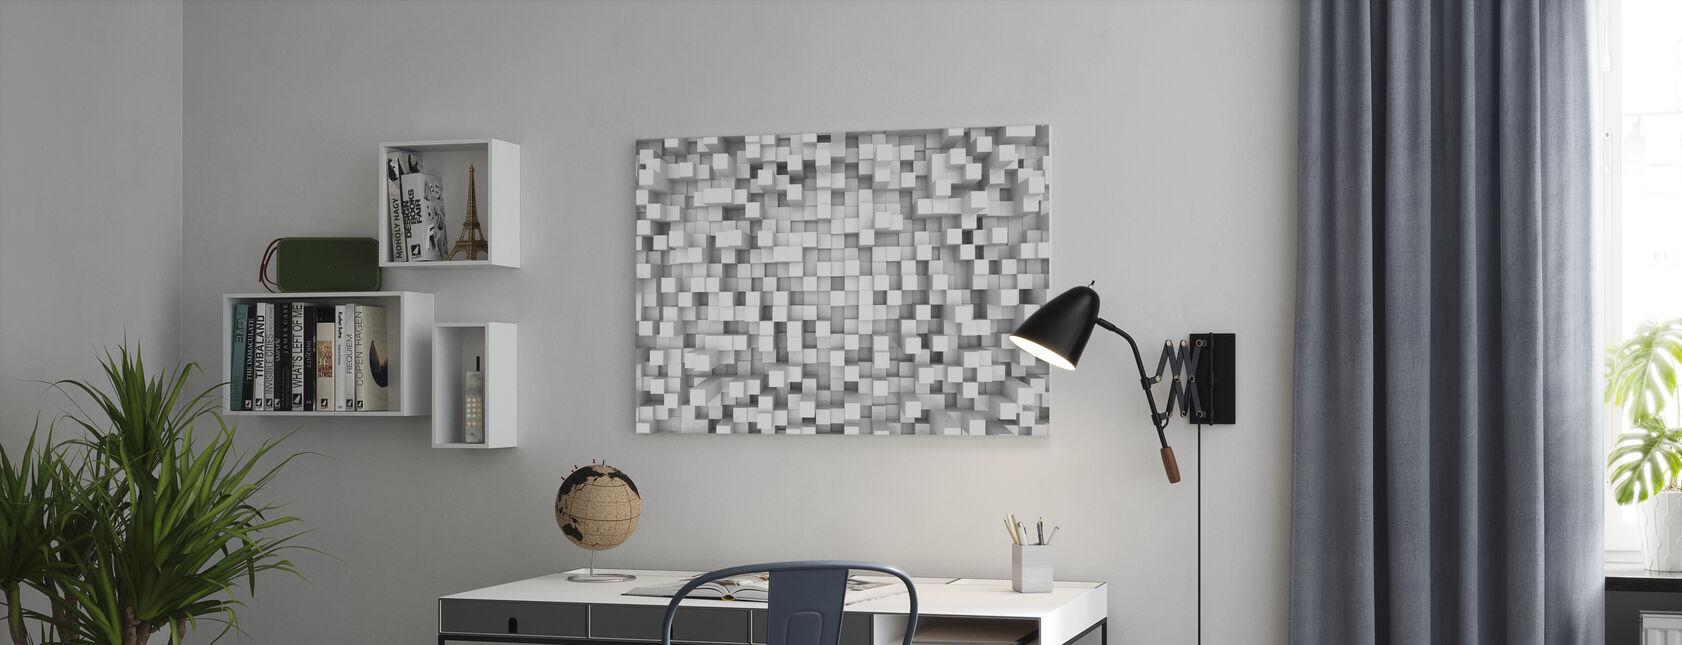 Tetris Pattern - Canvas print - Office